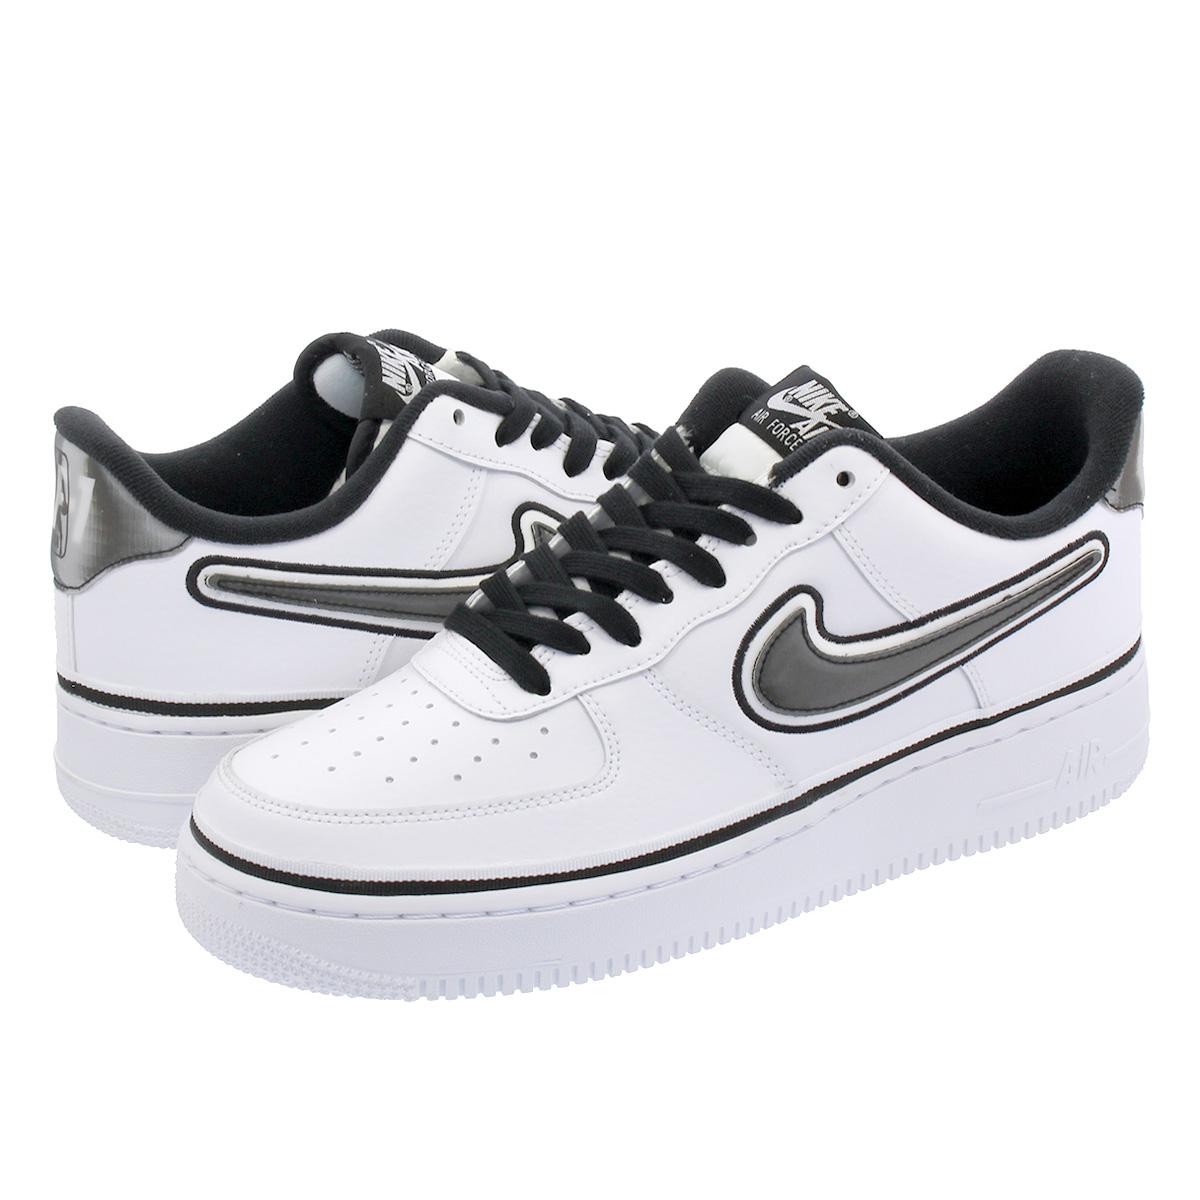 sports shoes fcf4e 975fb NIKE AIR FORCE 1  07 LV8 SPORTS Nike air force 1  07 LV8 WHITE BLACK  aj7748-100